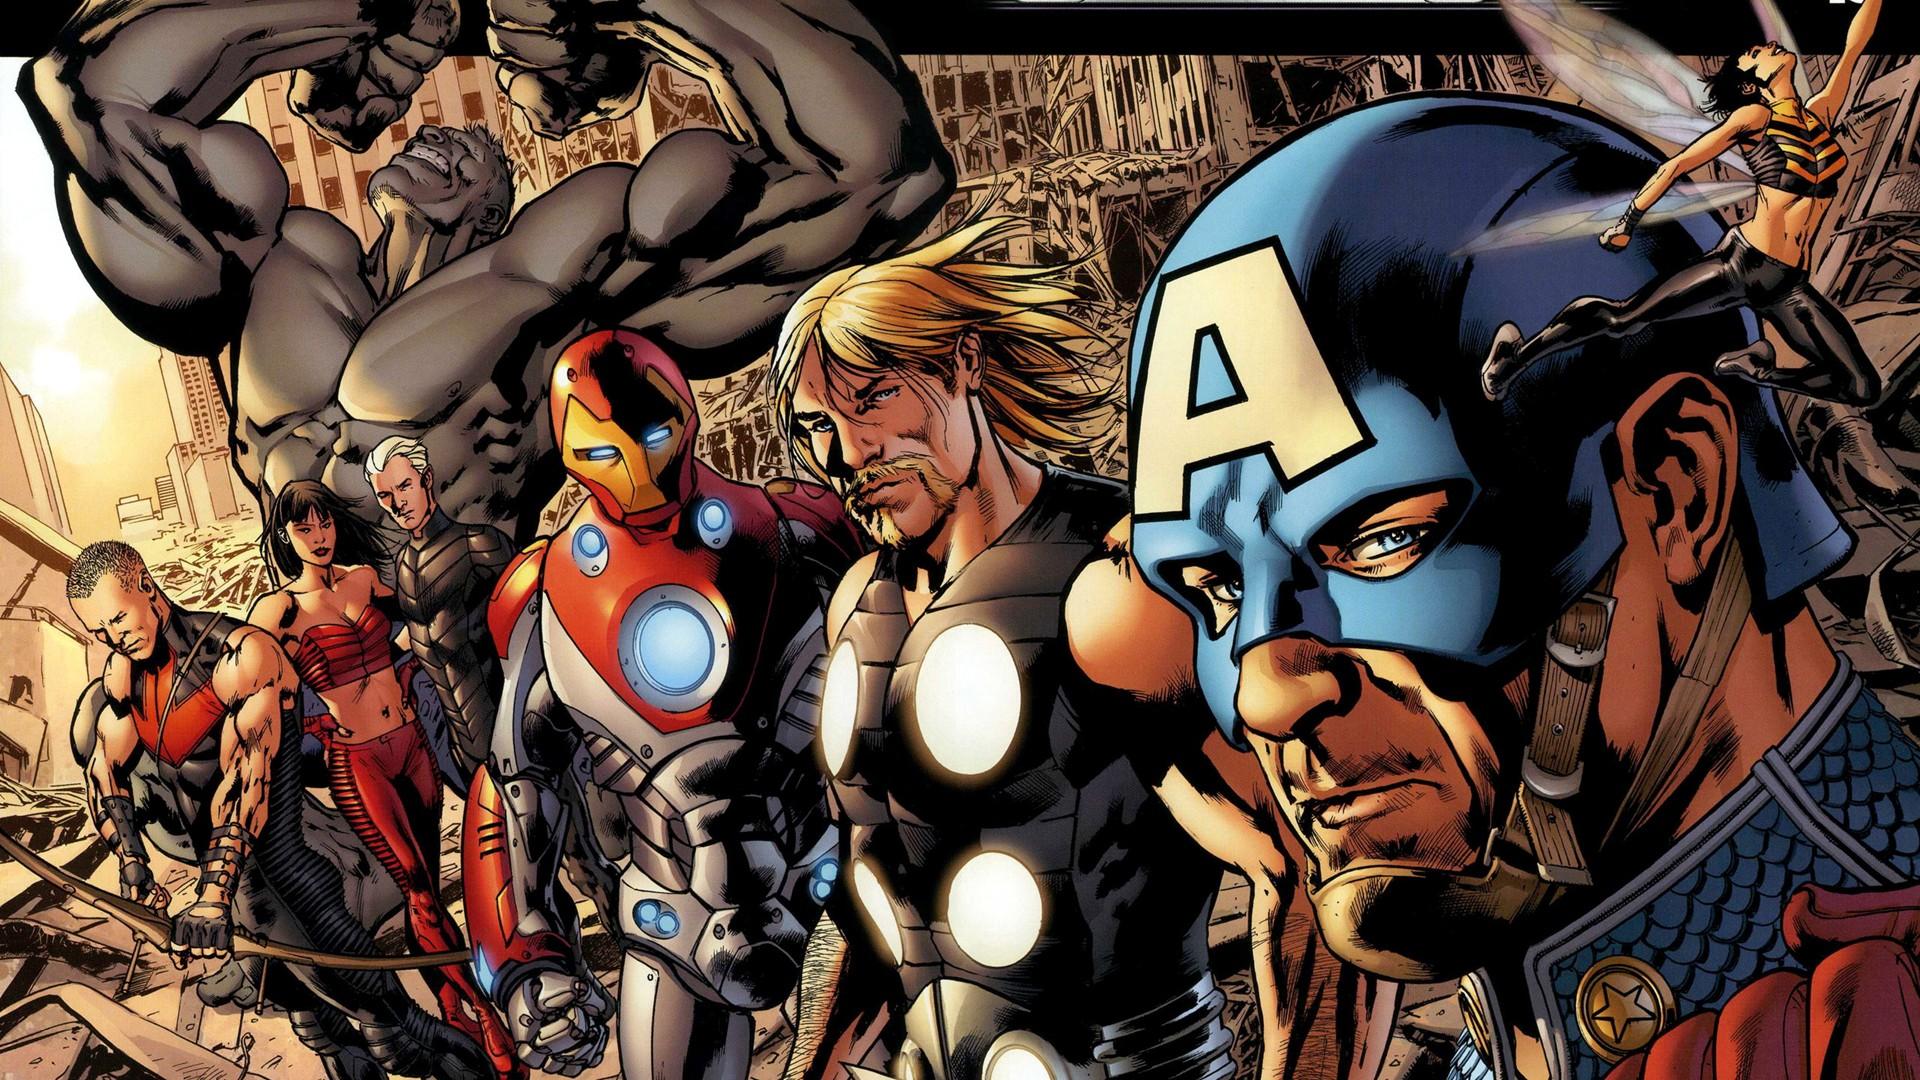 Fond D Ecran Thor Anime Dessin Anime Super Heros Marvel